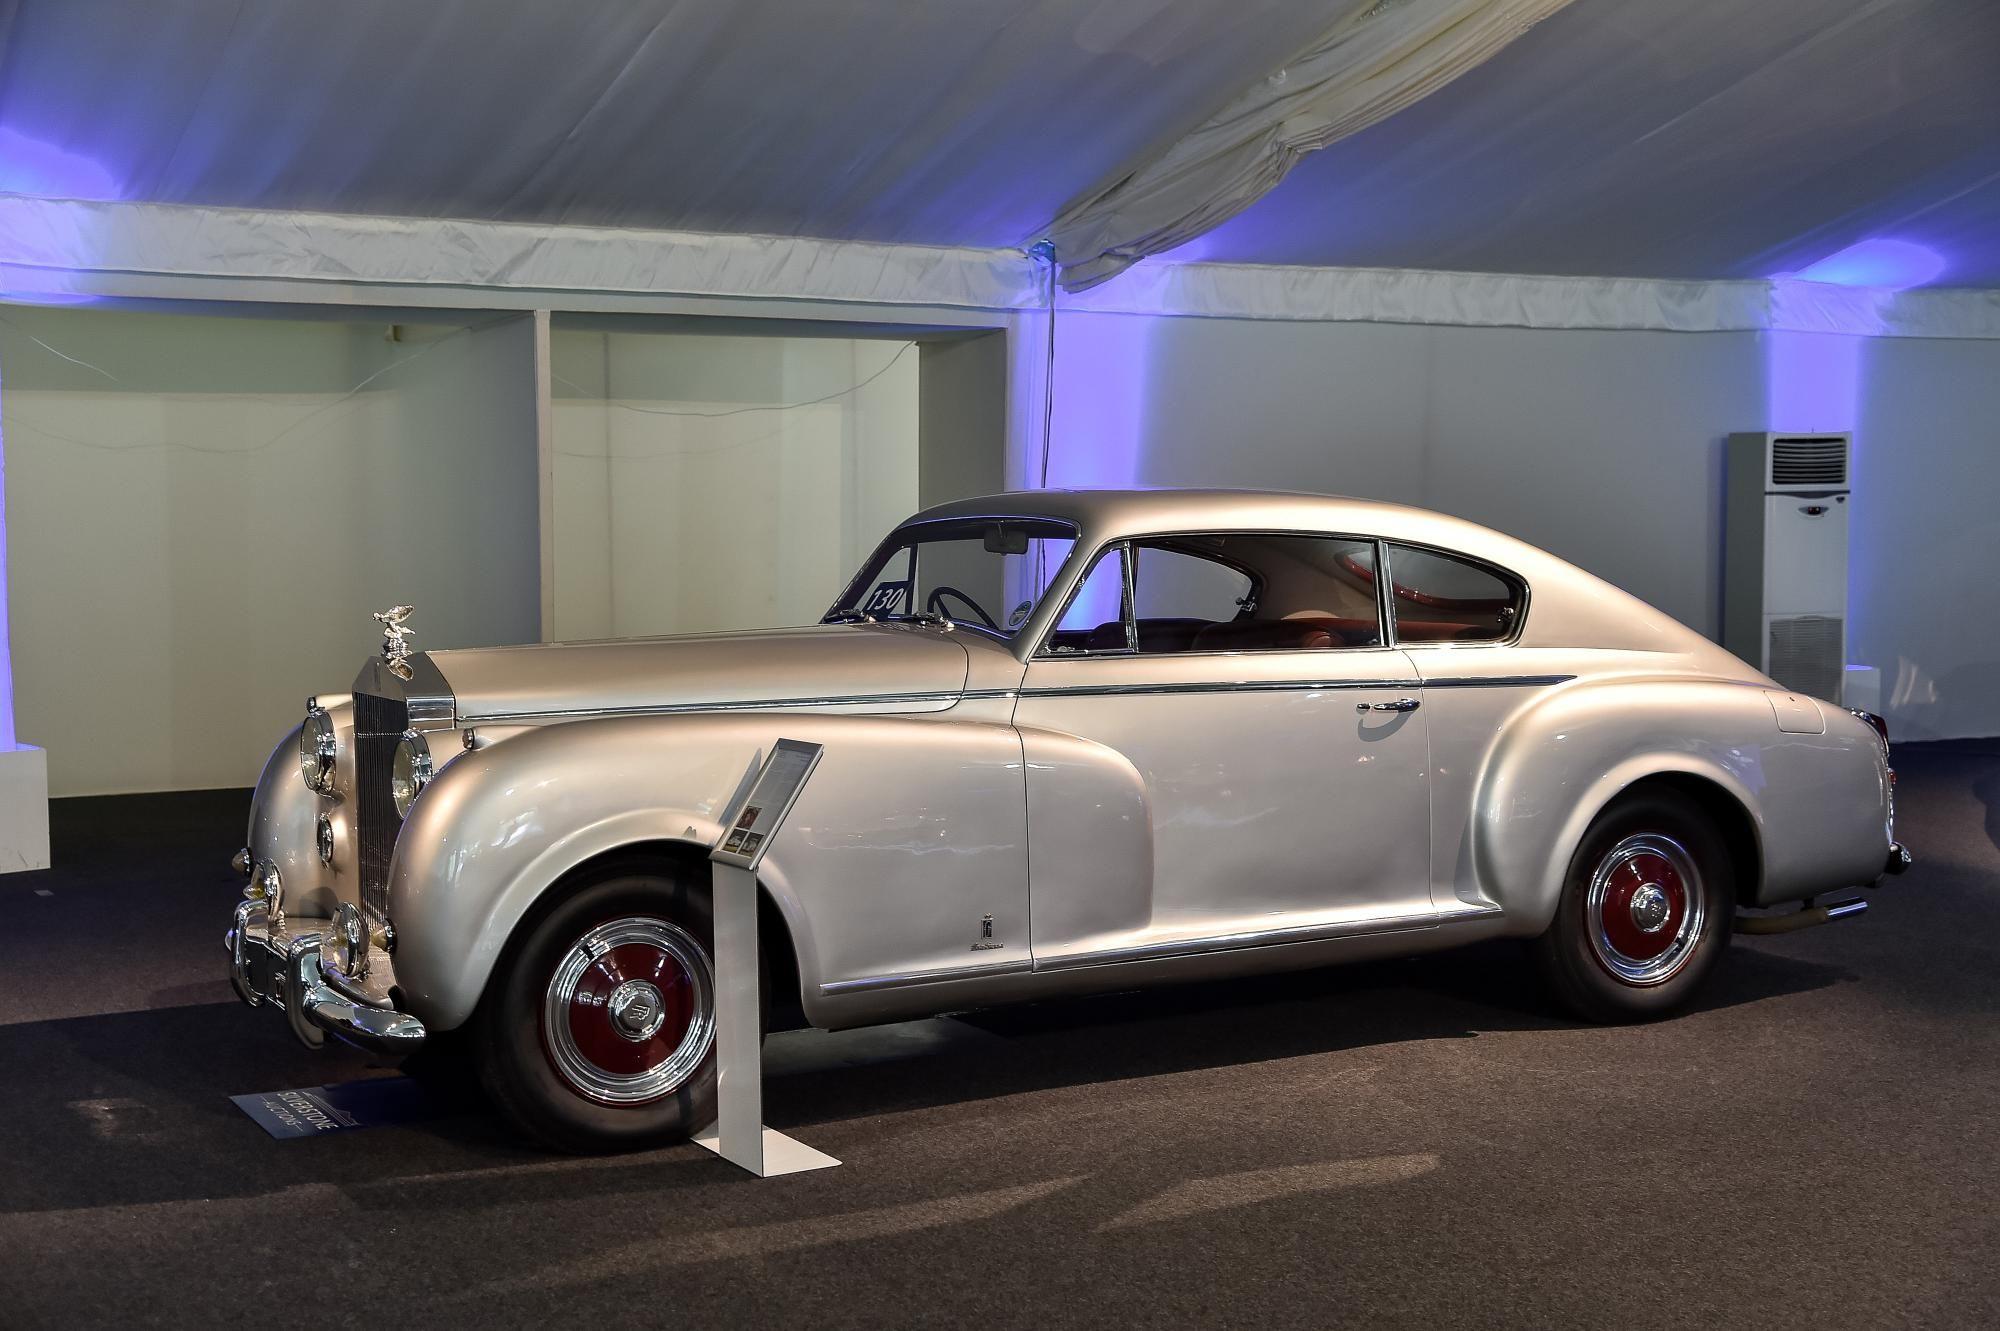 1956 desoto firedome seville 4 door hardtop 1 of 10 - 1955 Desoto Fireflite Four Door Sedan Desoto 1951 1956 Pinterest Sedans Cars And Plymouth